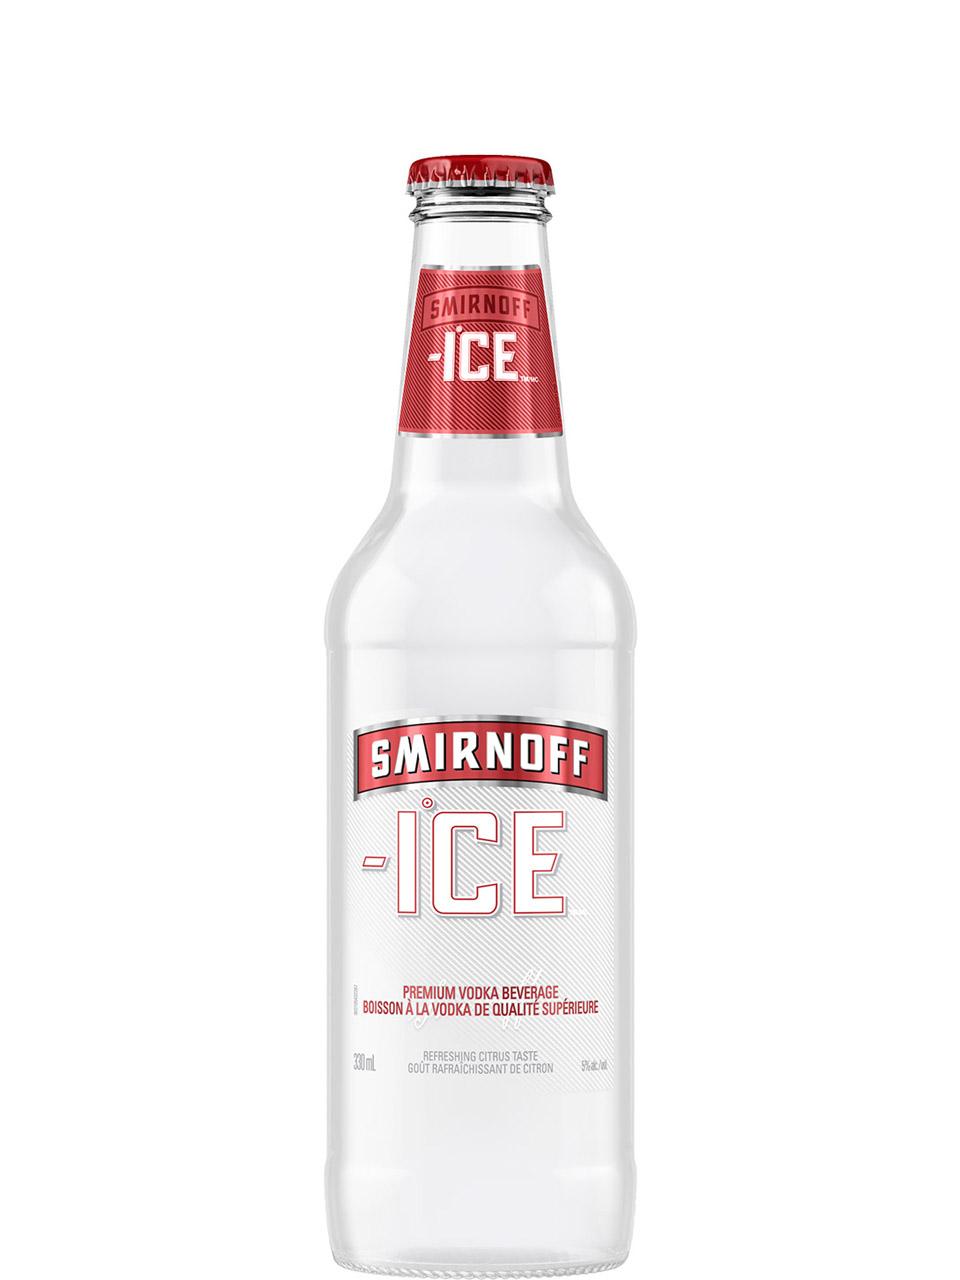 Smirnoff Ice 12 Pack Bottles